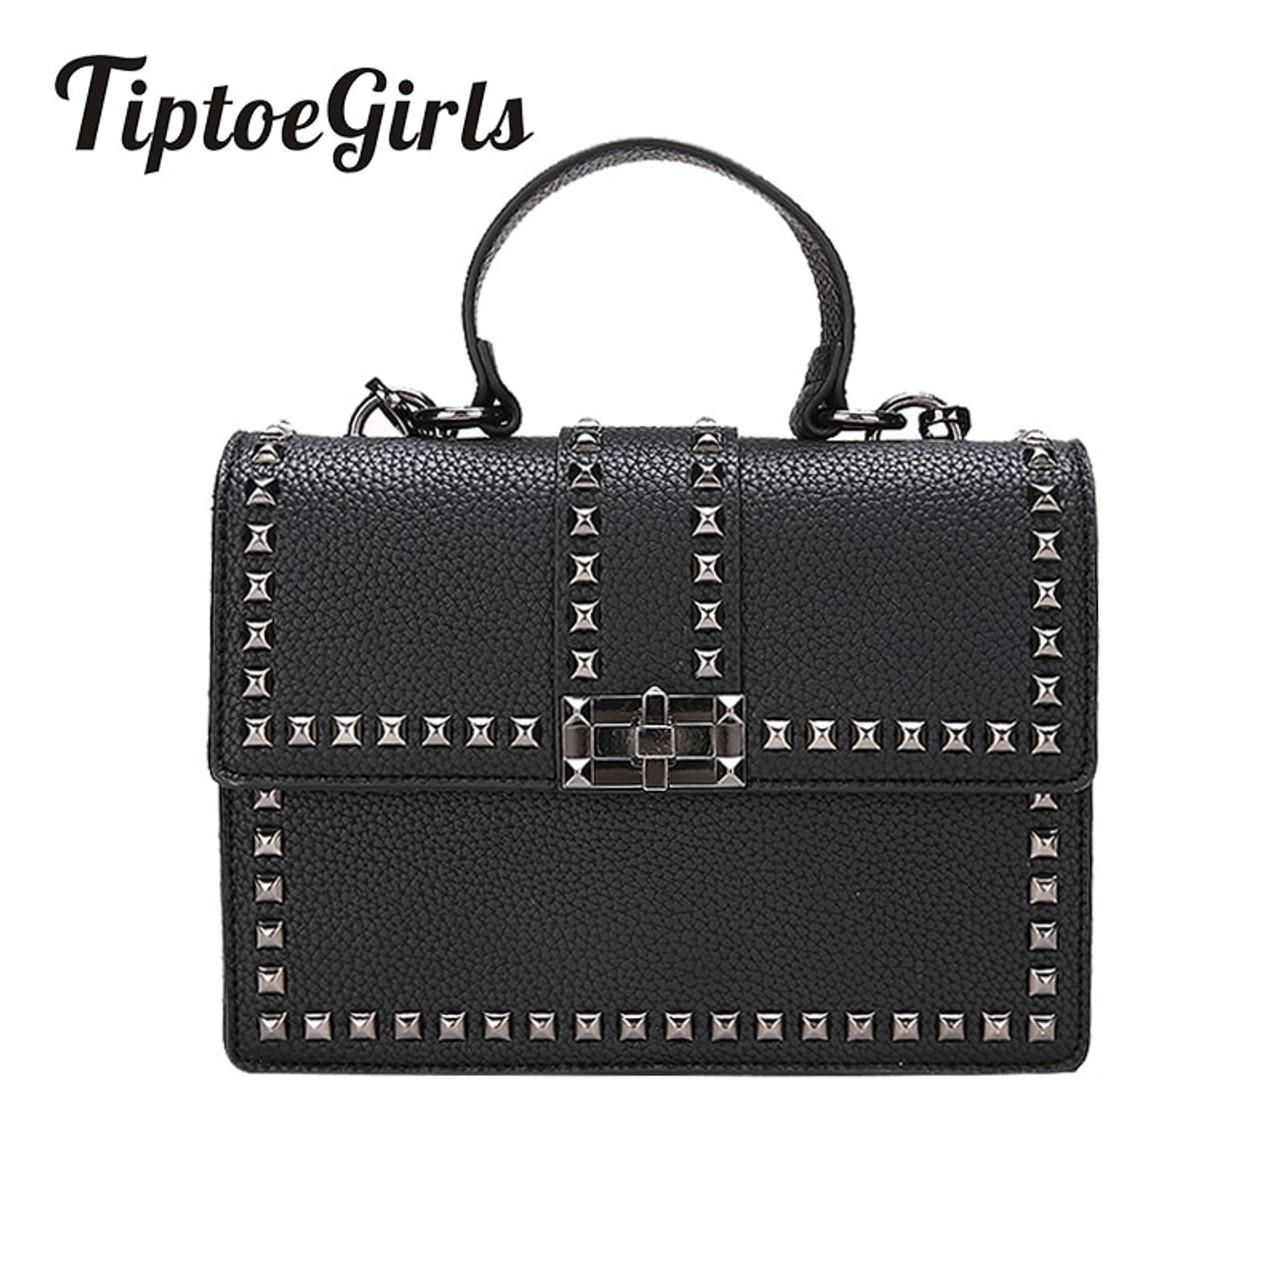 2018 Brand Women Bags Luxury Handbags Women Messenger Bags Cover Rivet Bag  Girls Fashion Shoulder Bag Ladies PU Leather Handbags - OnshopDeals.Com bda4d631da13d